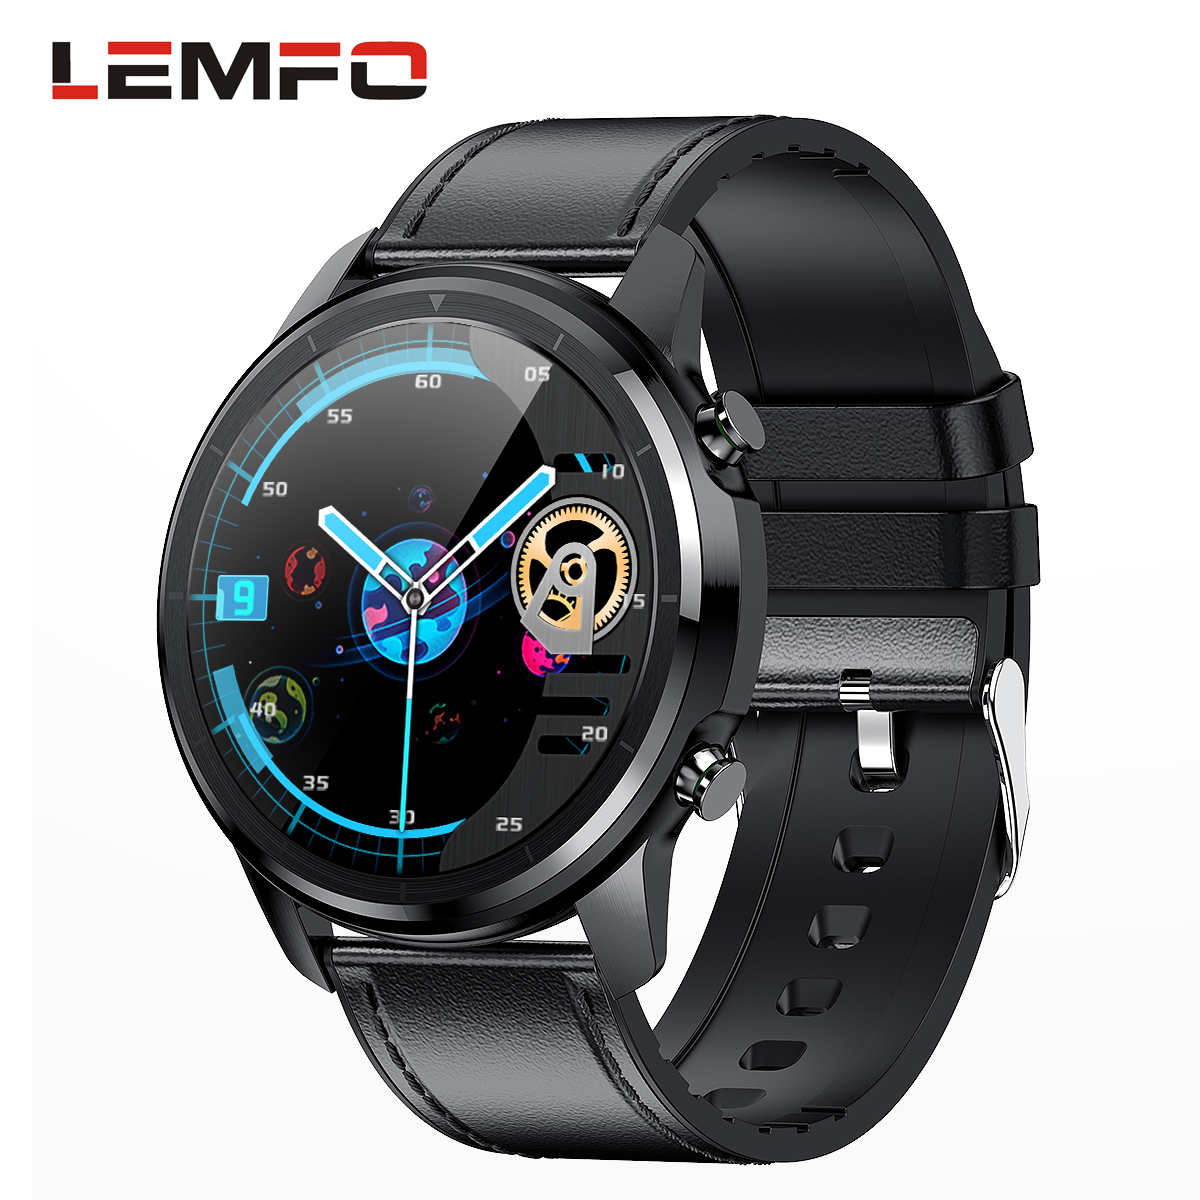 Lemfo LF26 Round Dial Smart Bracelet 150mAh IP67 Waterproof Bluetooth 5.0 1.3 inch Full HD IPS Screen Watch black_Black leather strap